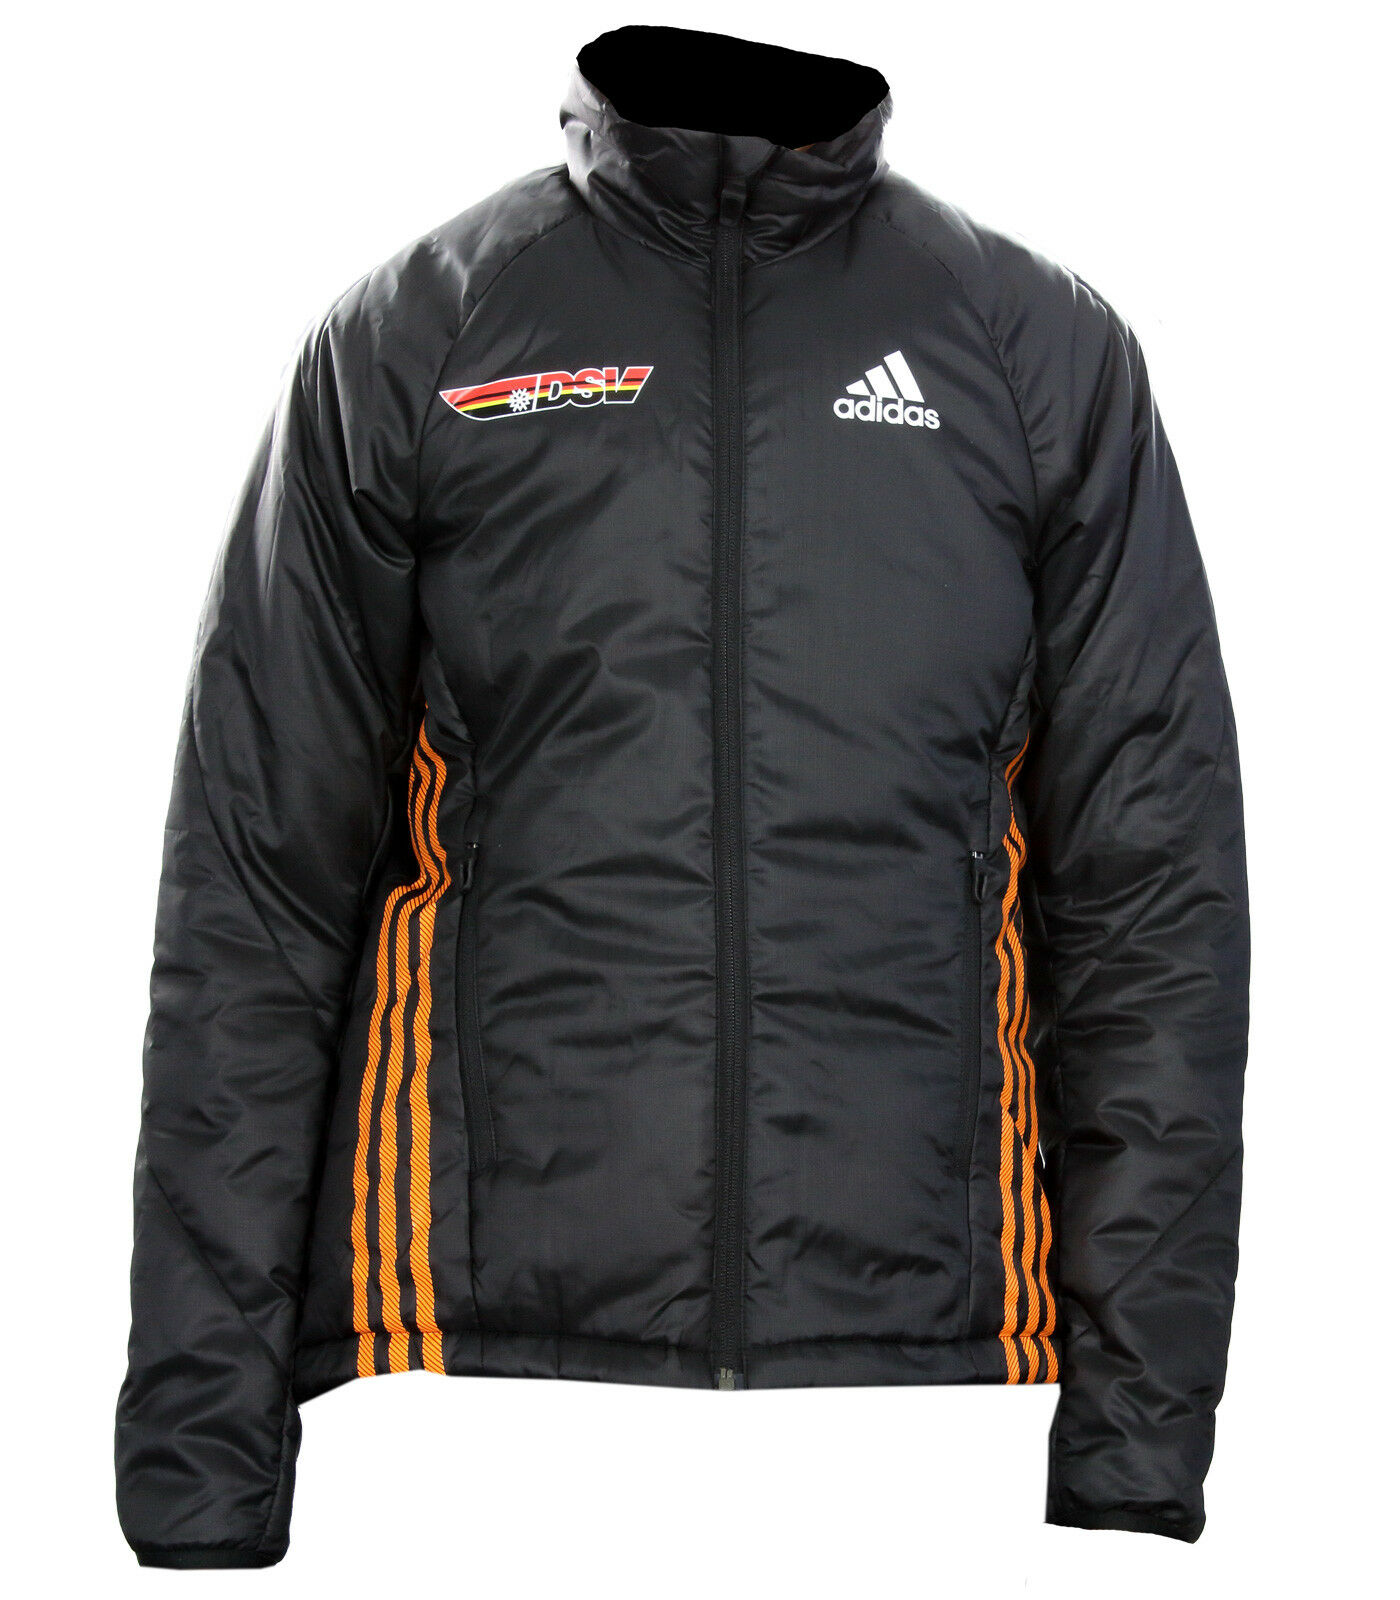 Adidas Damen DSV Athleten Primaloft Jacke Biathlon Langlauf Olympia Olympia Olympia Gr. XS-S 2e57b6